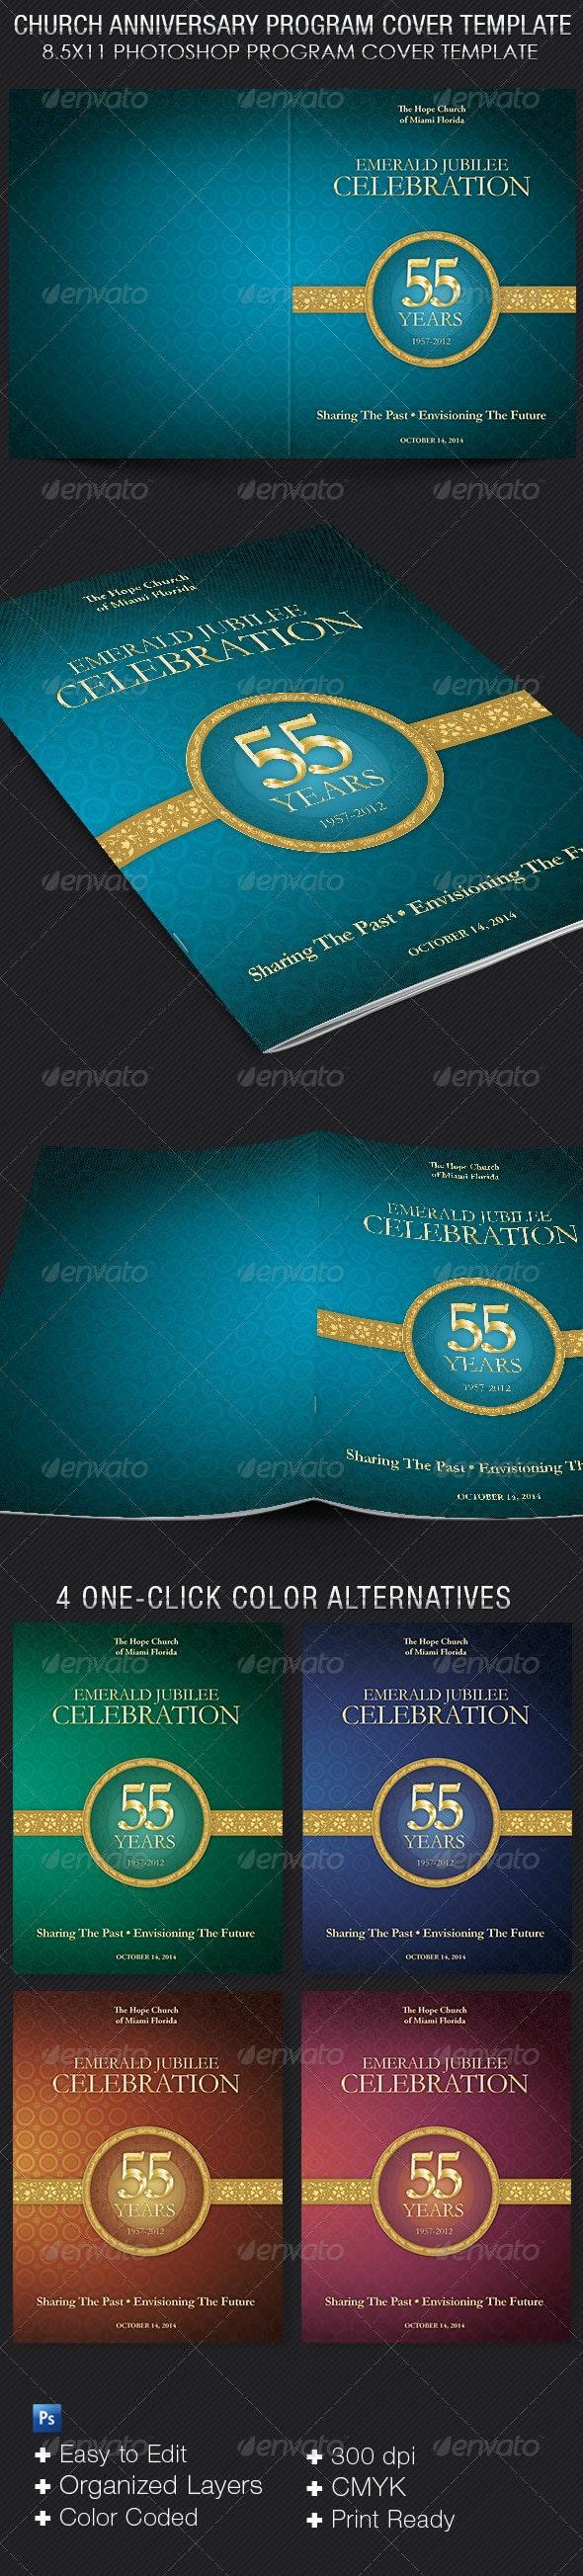 Church Anniversary Program Cover Template  - Informational Brochures